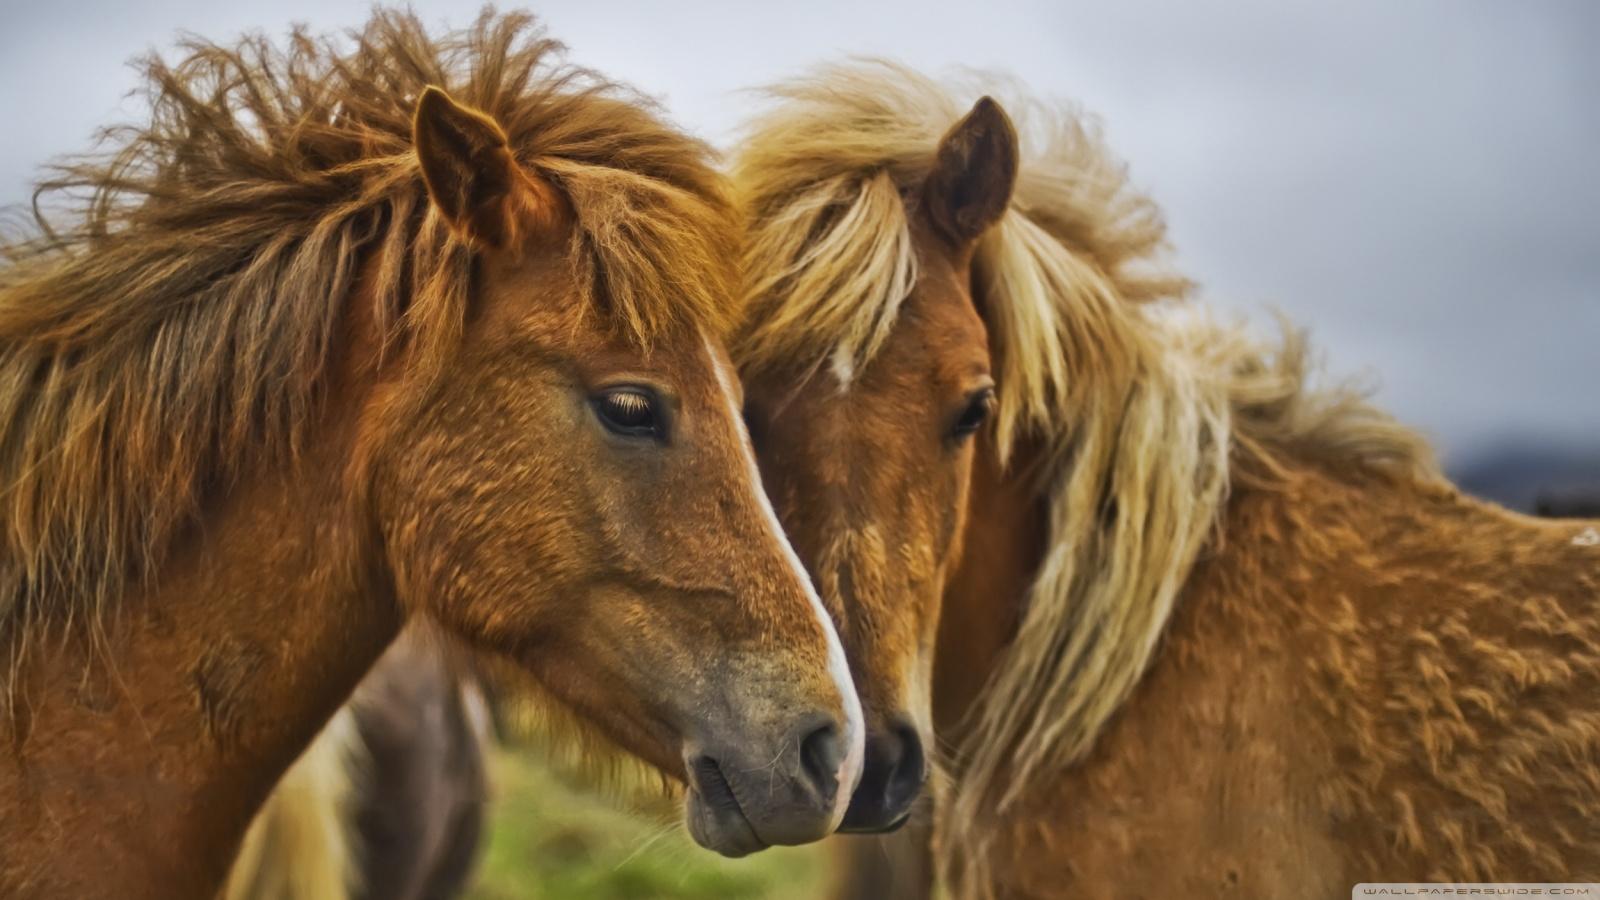 Horses HD Wallpapers Great Horses Animal Photo 1600x900